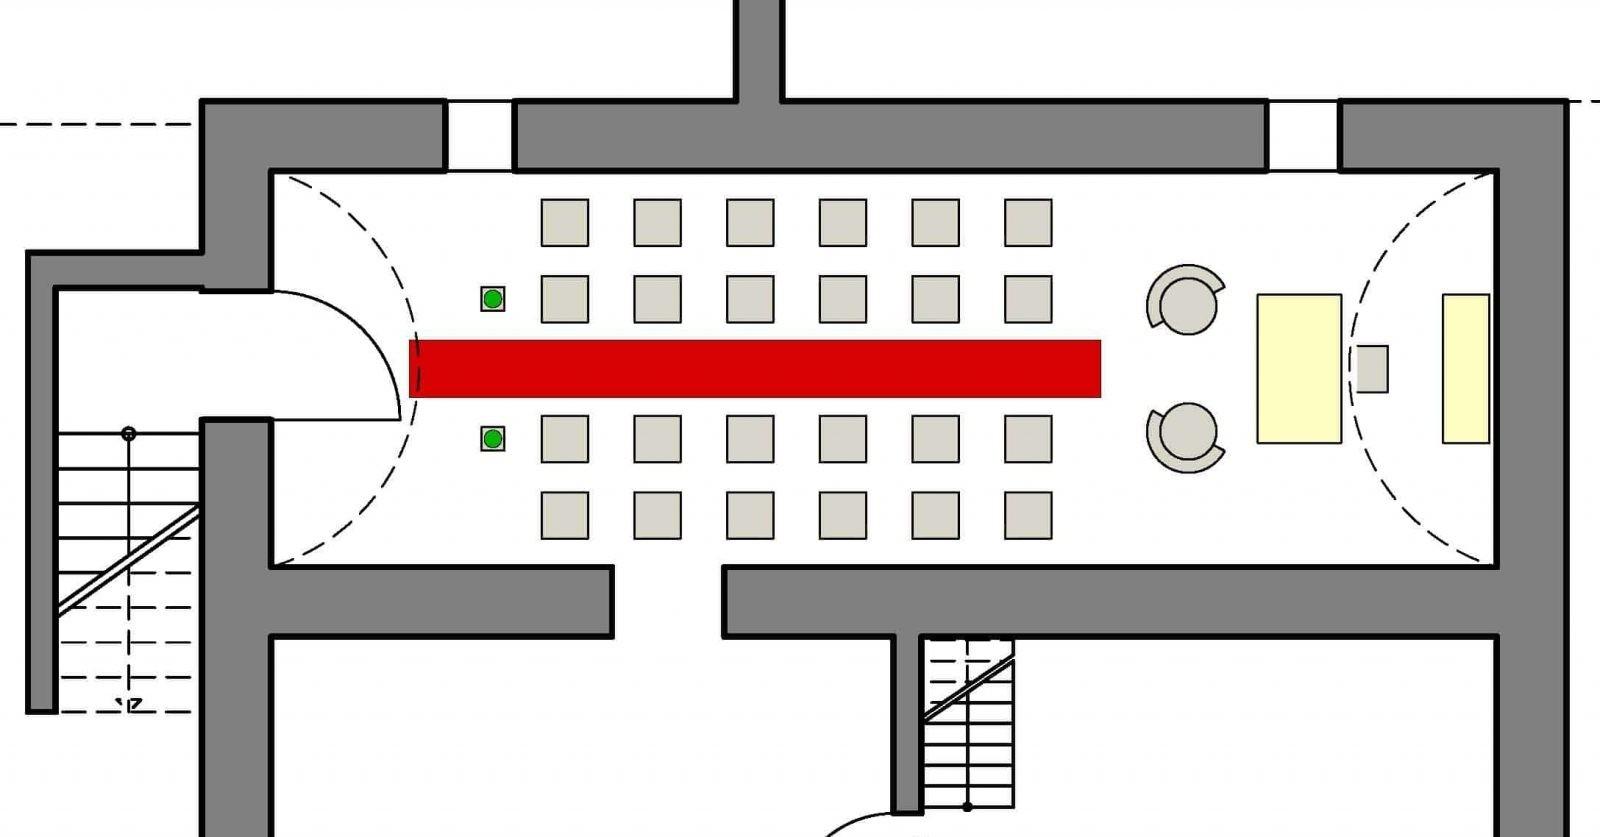 Grundriss Gewölbekeller Haus in Bewegung Seelscheid| Haus in Bewegung